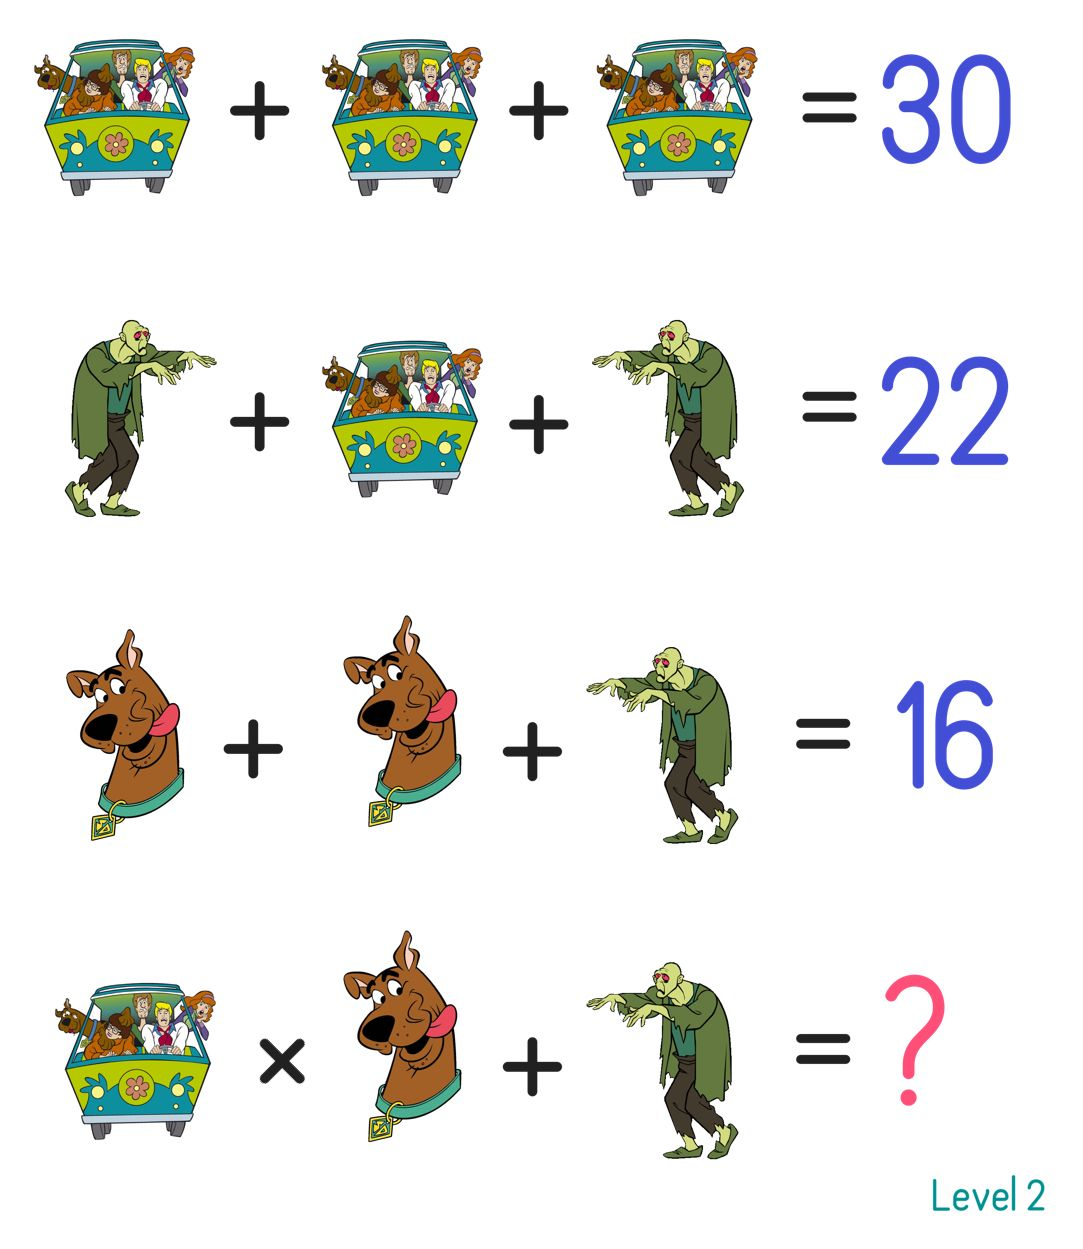 Maths Puzzles By Lori Myers On Mash Up Math